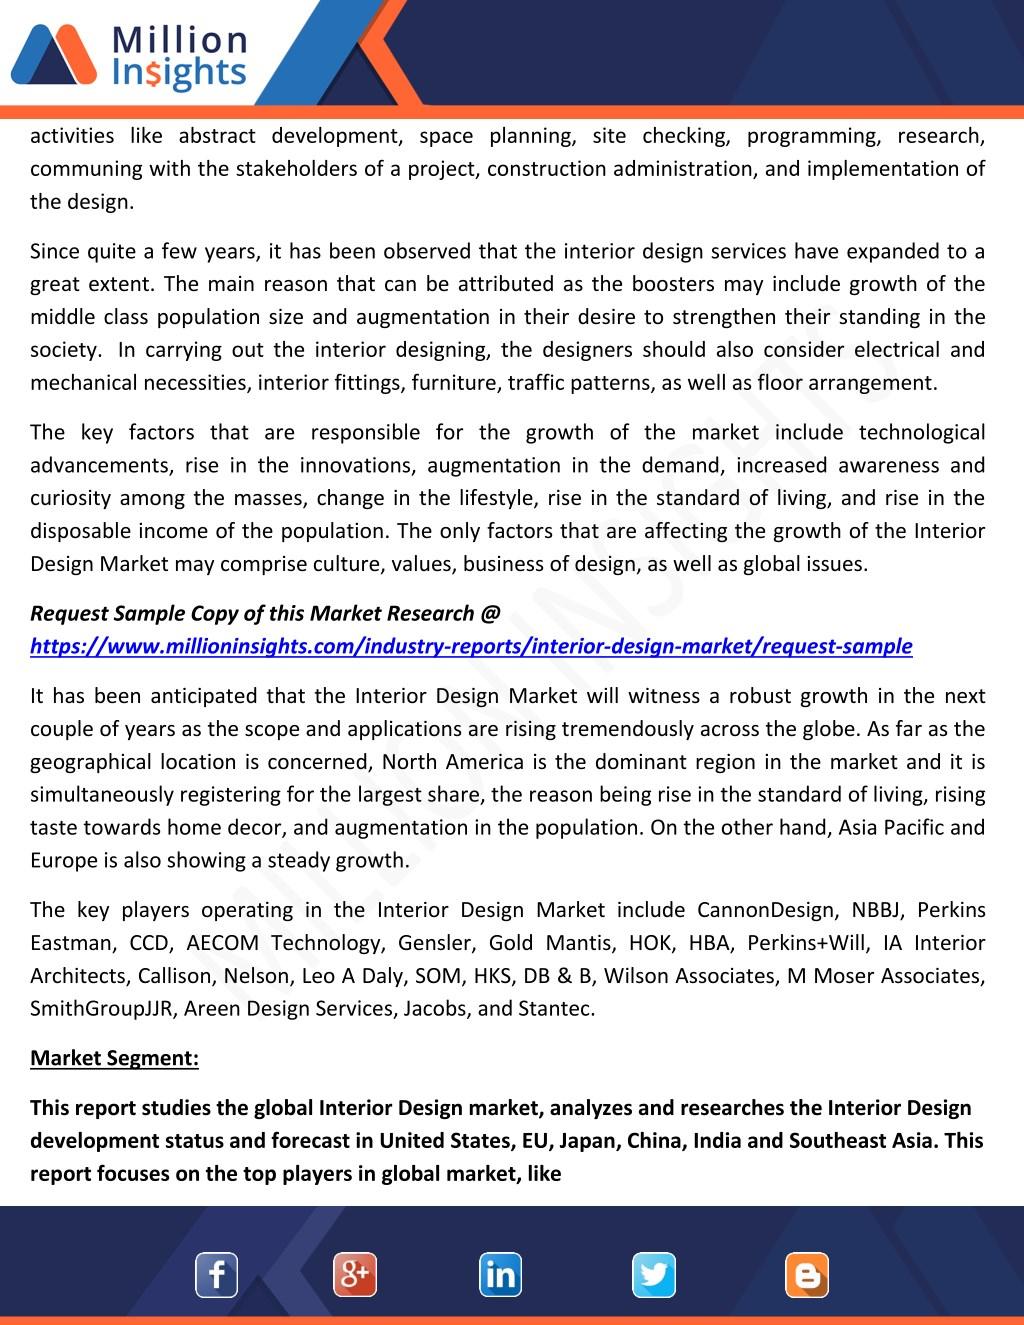 PPT - Interior Design Market Trends, Dynamics and Market